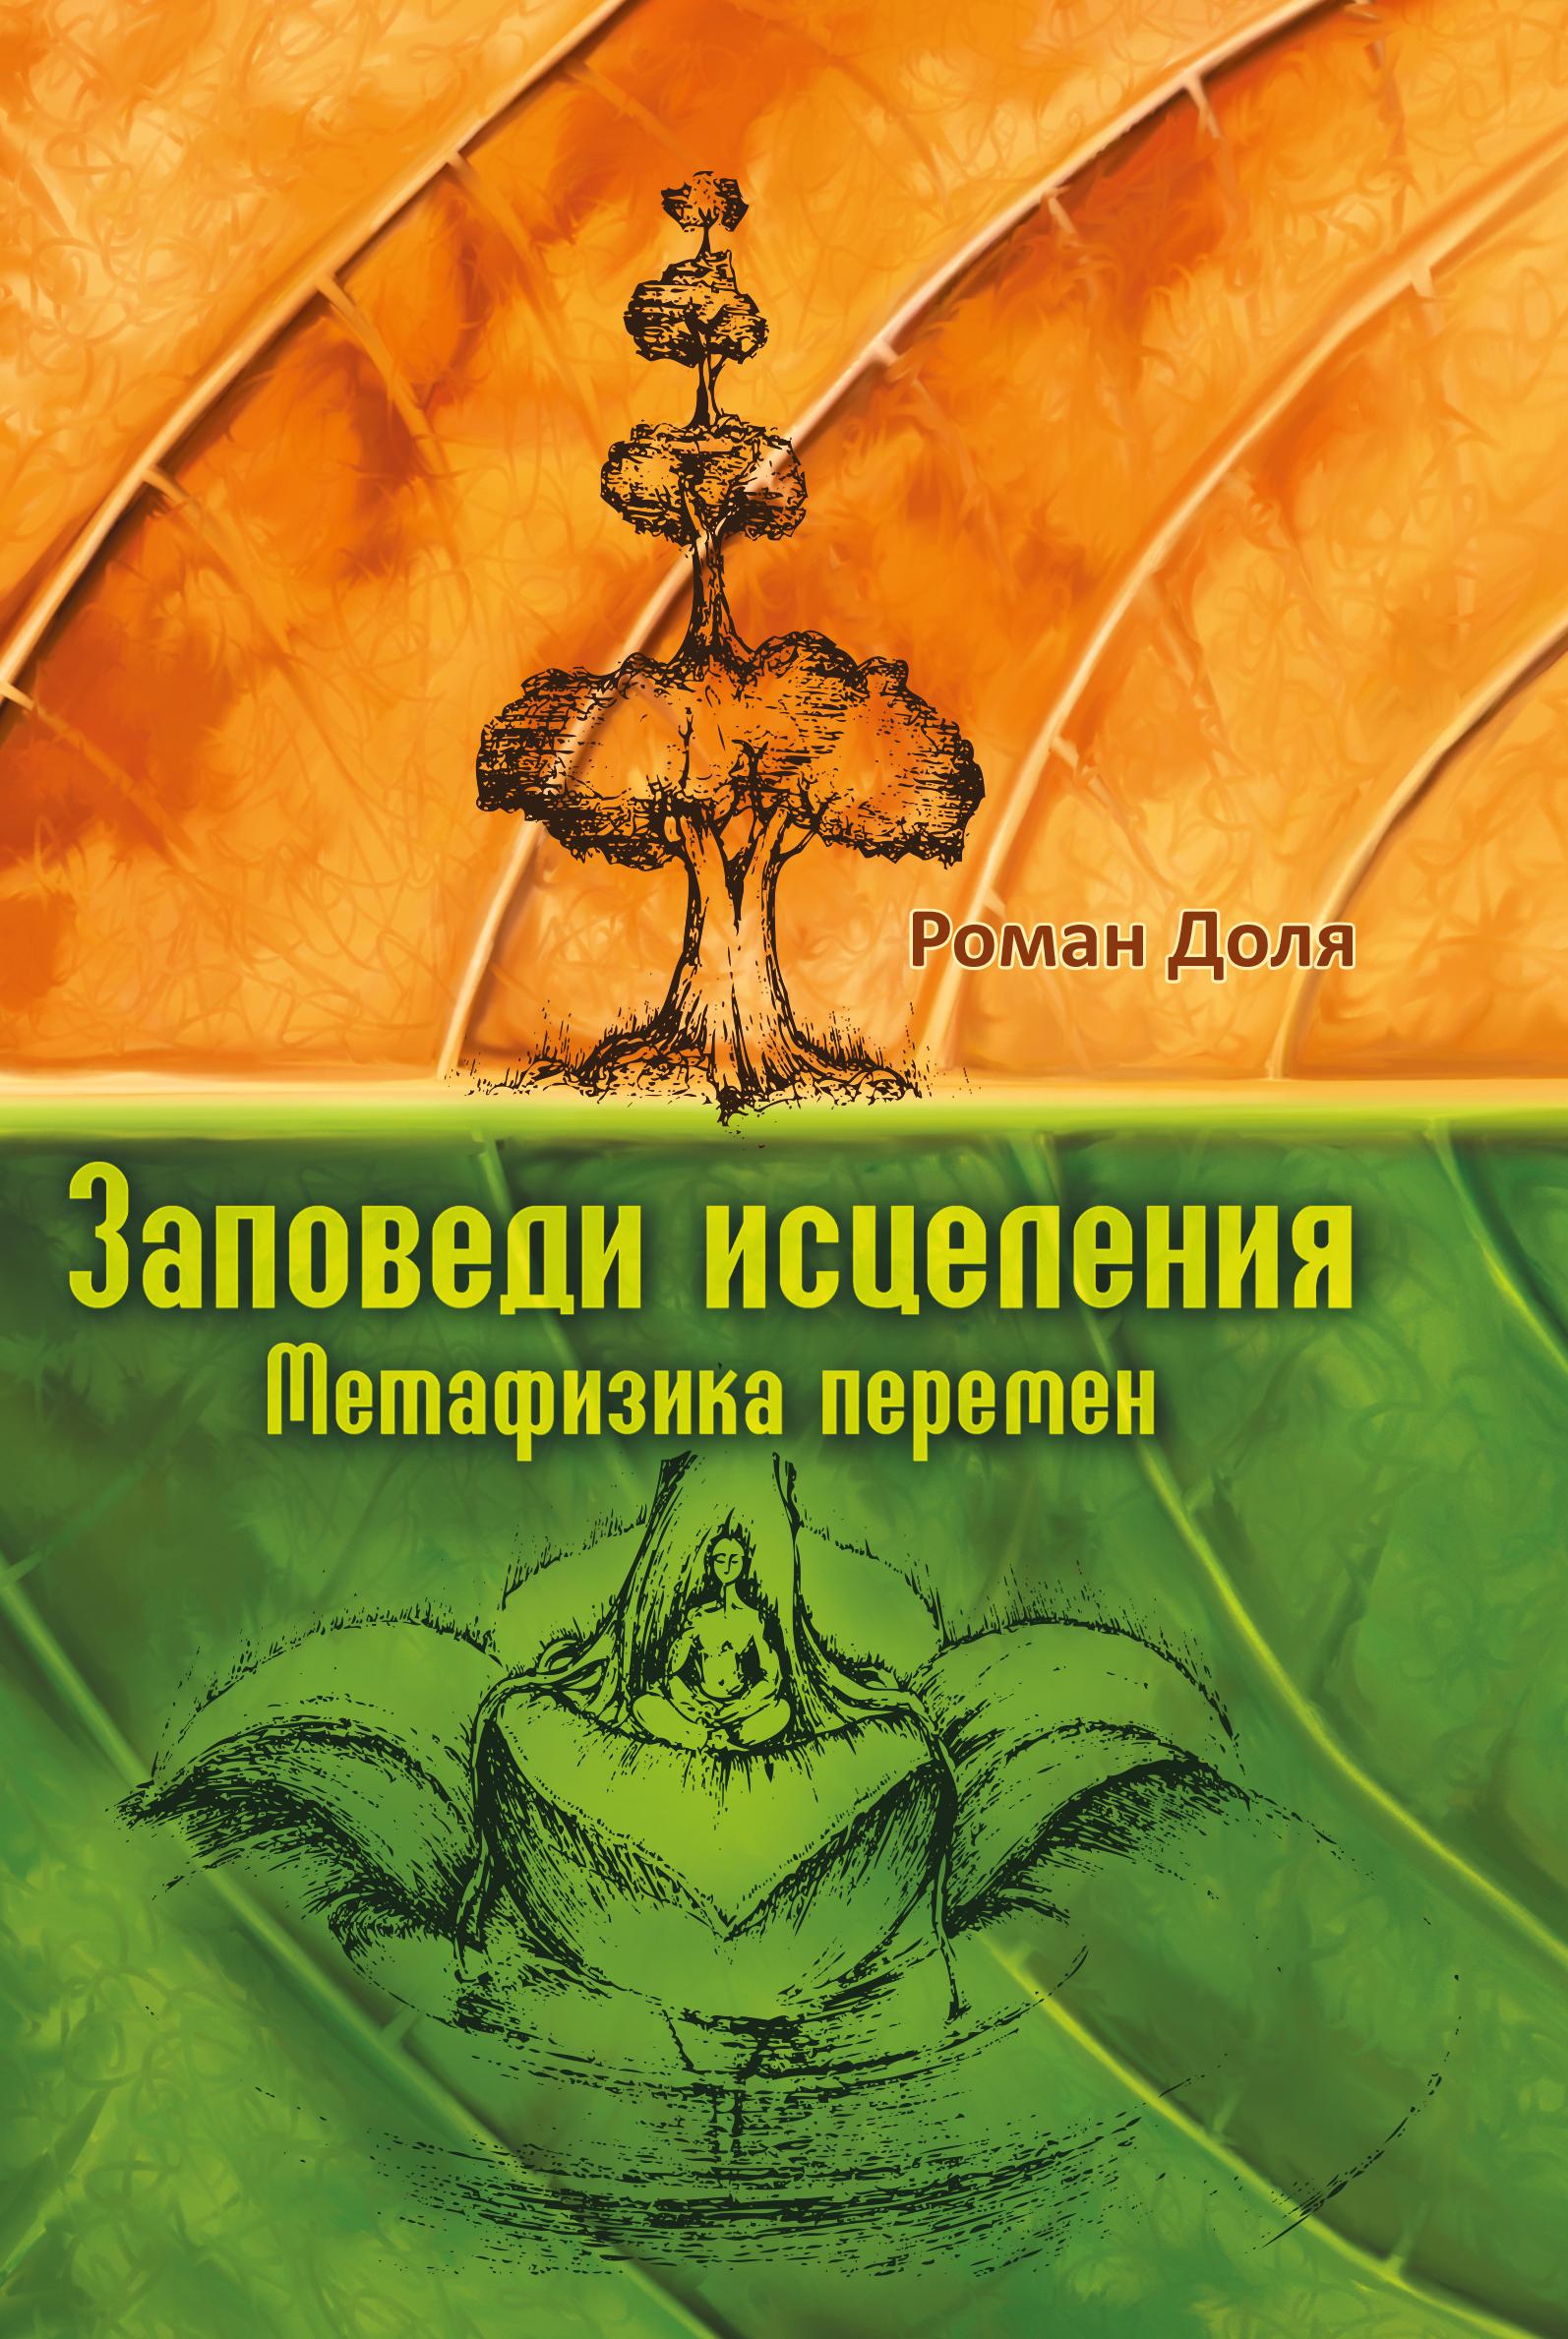 эзотерика метафизика паразиты в организме